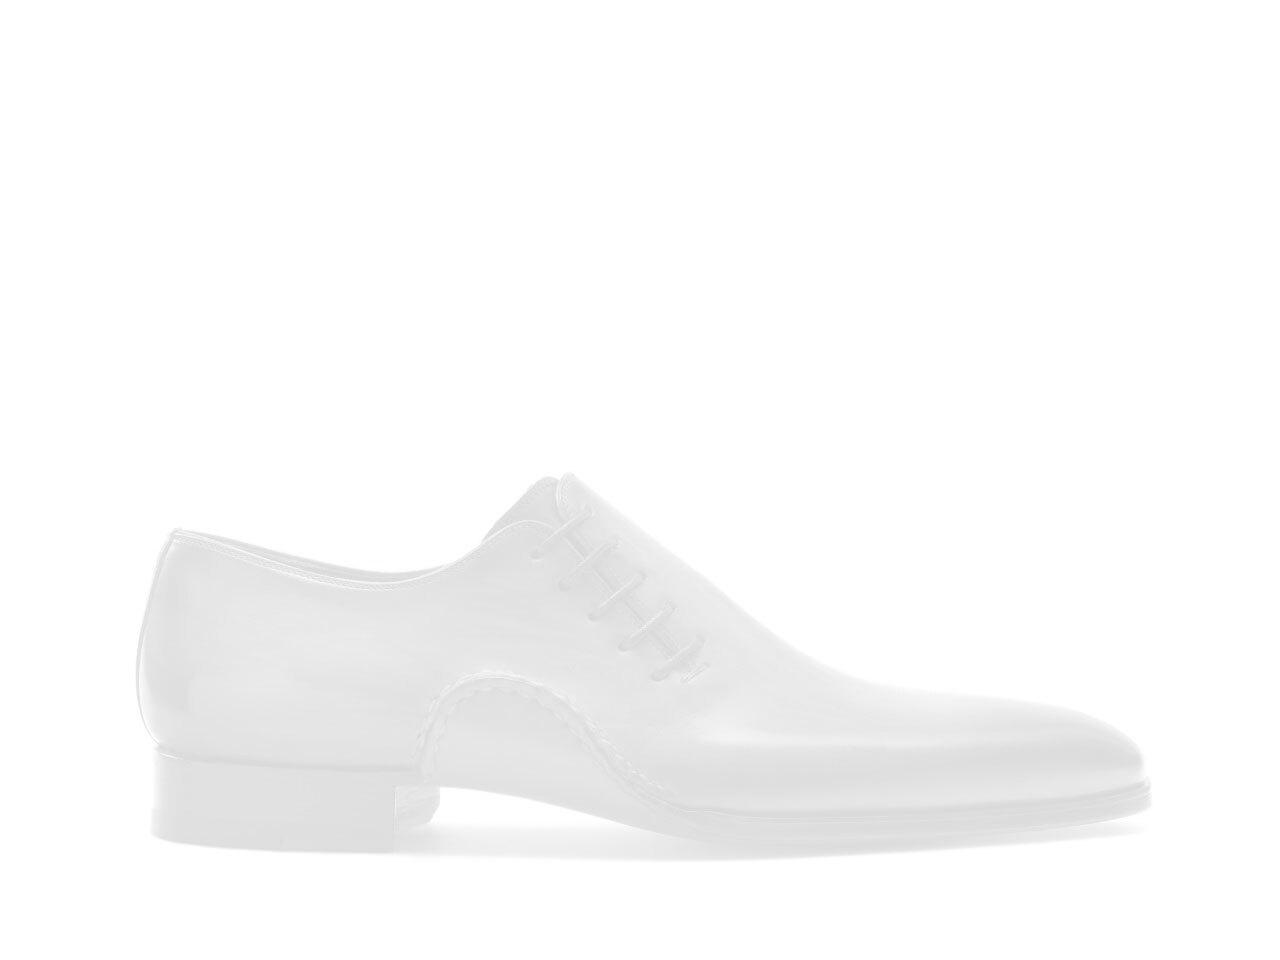 Sole of the Magnanni Merino Grey Men's Sneakers